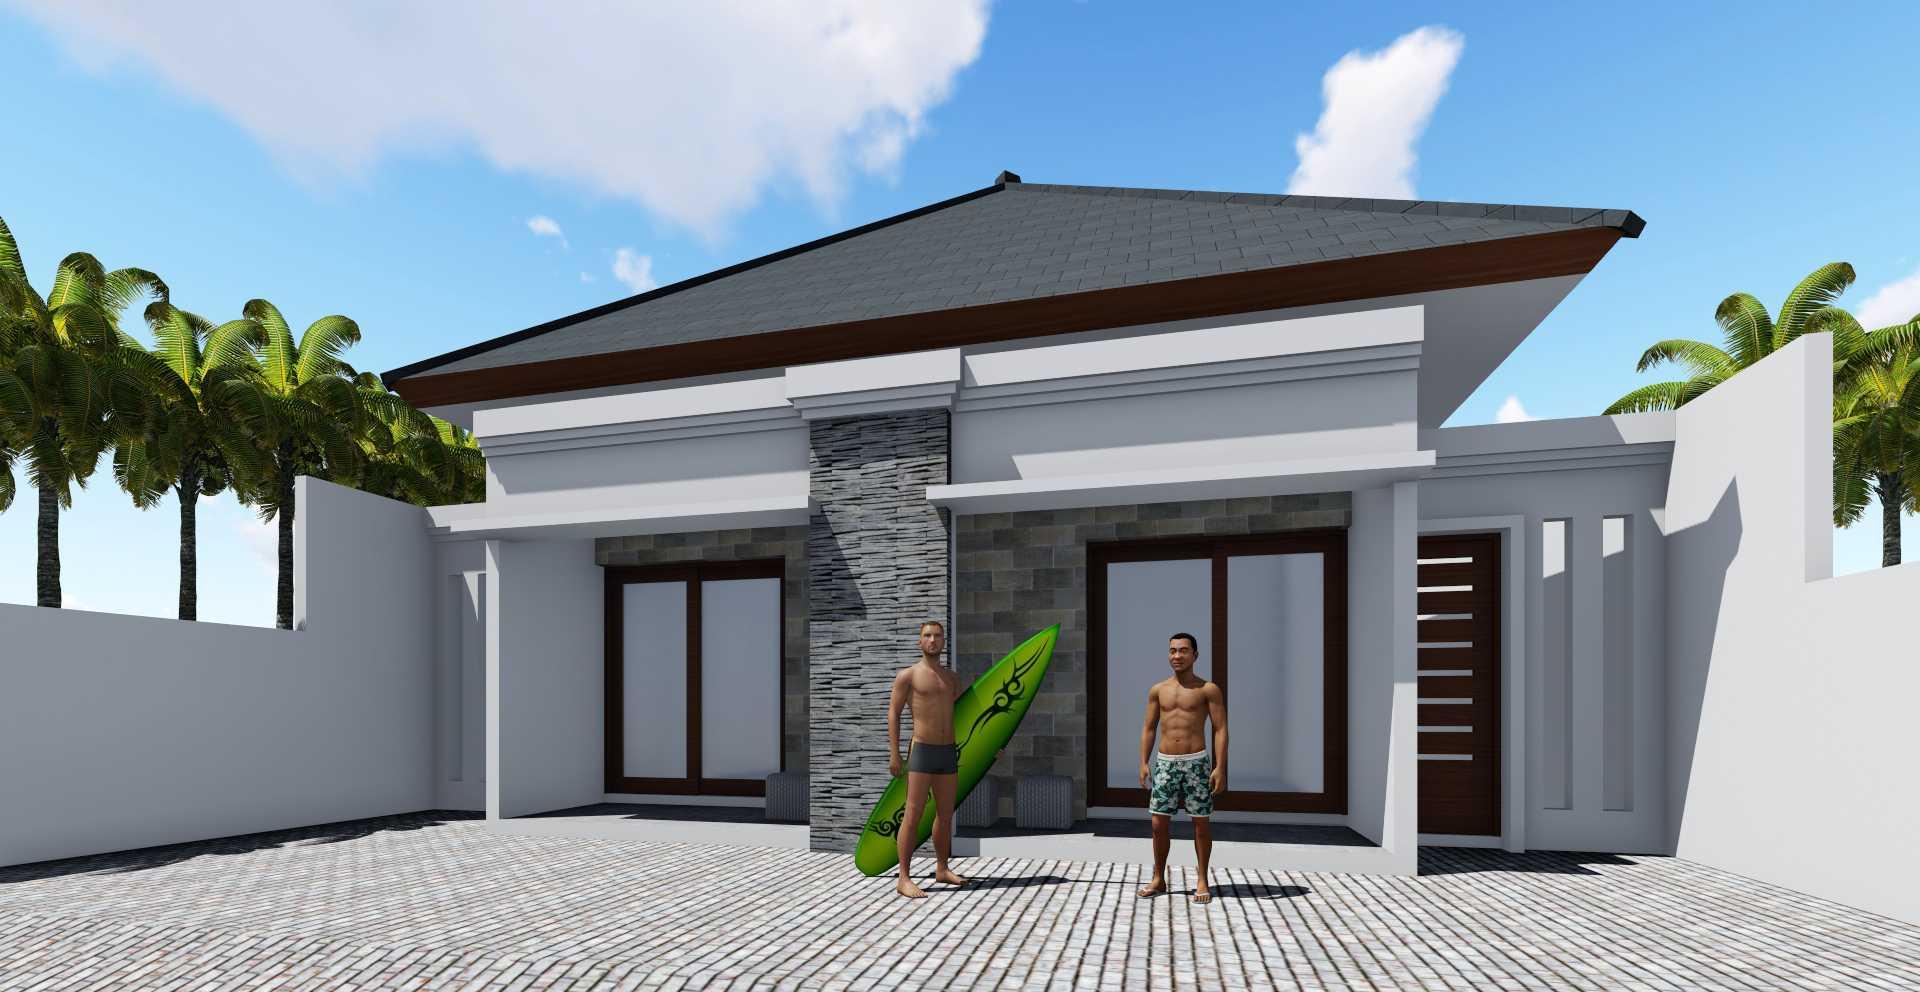 Mannor Architect Homestay Gorontalo Gorontalo, Kota Gorontalo, Gorontalo, Indonesia Gorontalo, Kota Gorontalo, Gorontalo, Indonesia Facade Day Time Tropical  40733